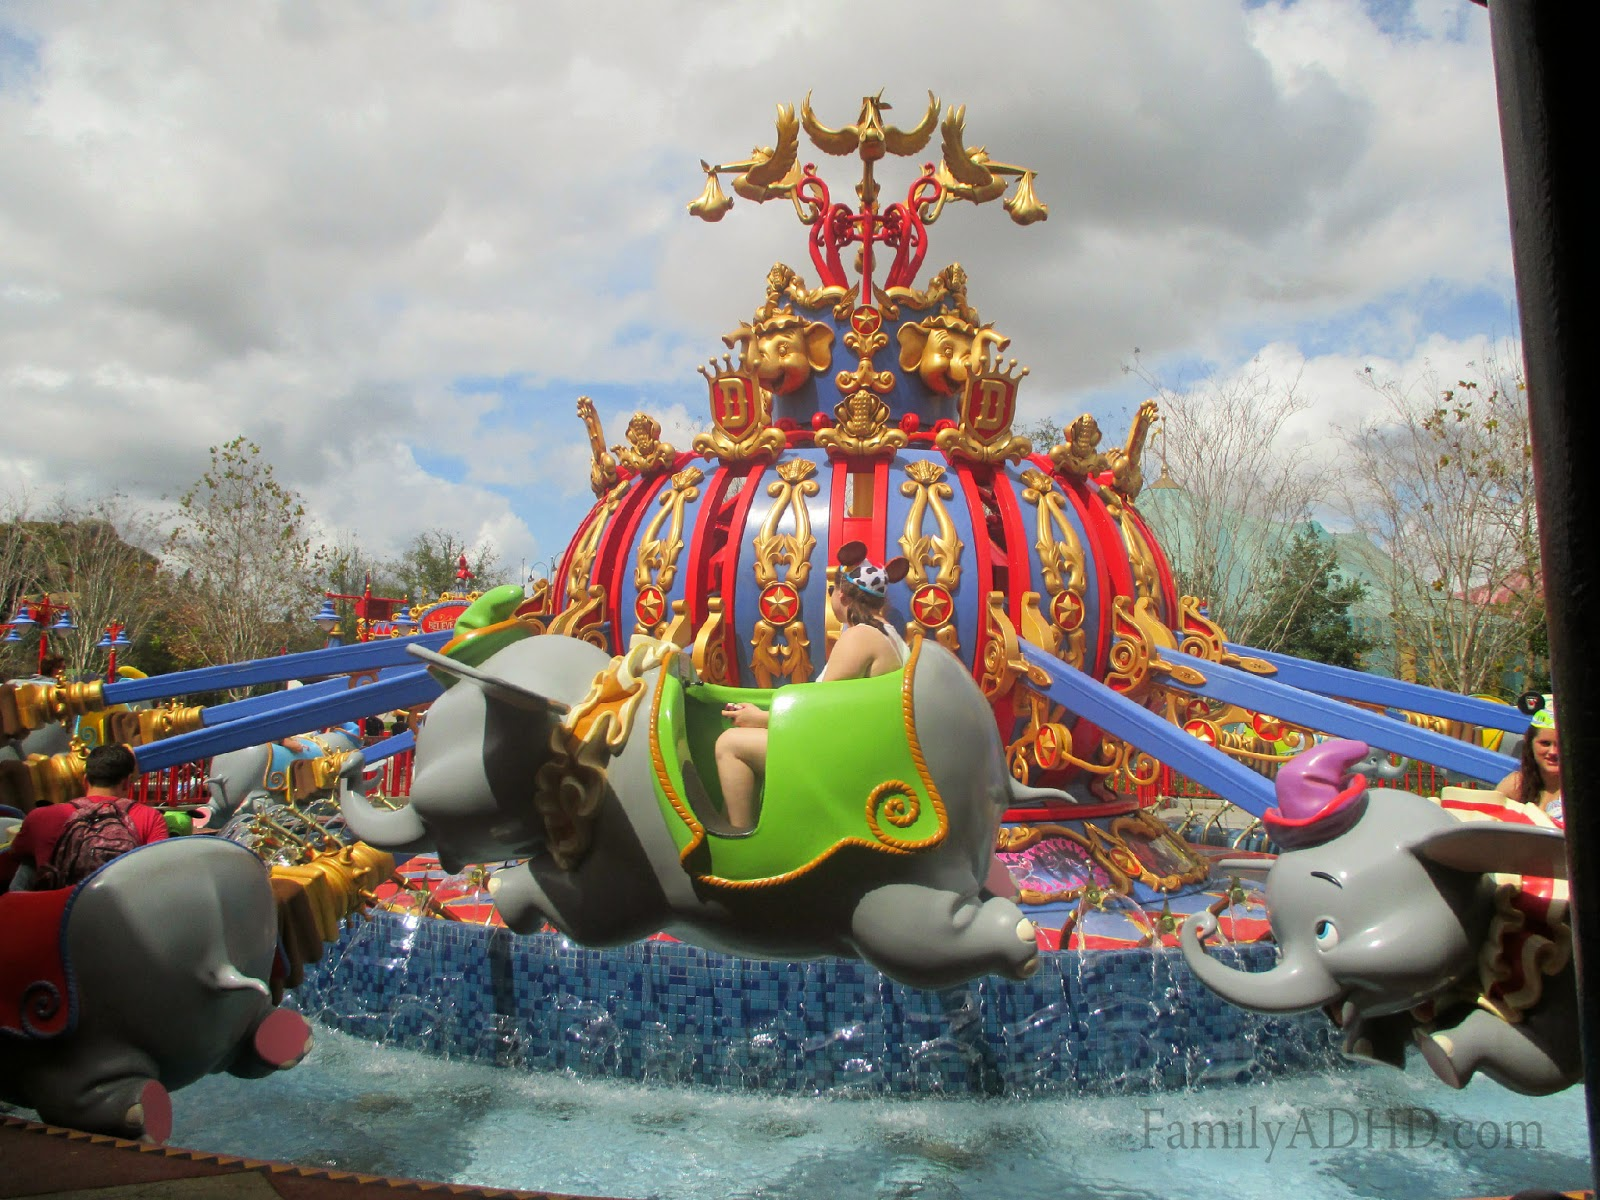 orlando family travel guide 2015 fantasyland seven dwarfs mine train ride